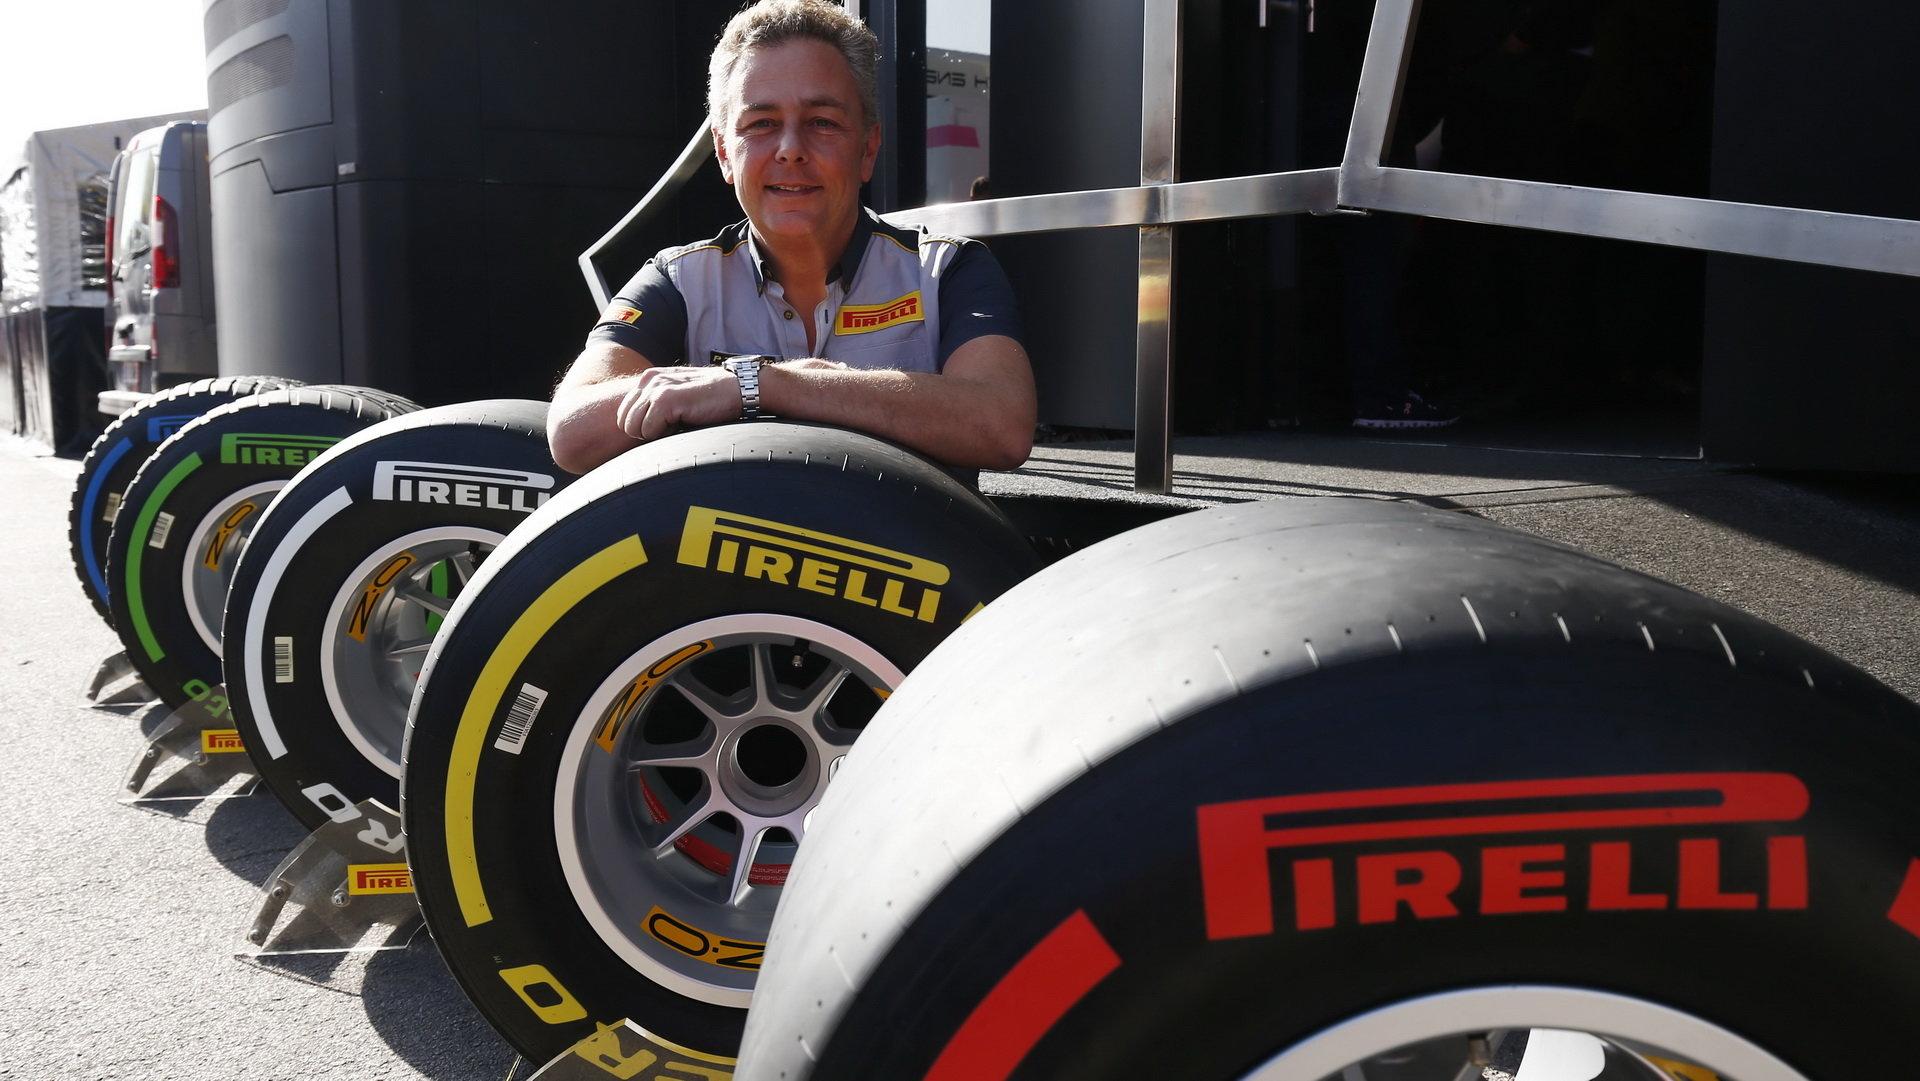 Mario Isola nechápe kritiku týmů